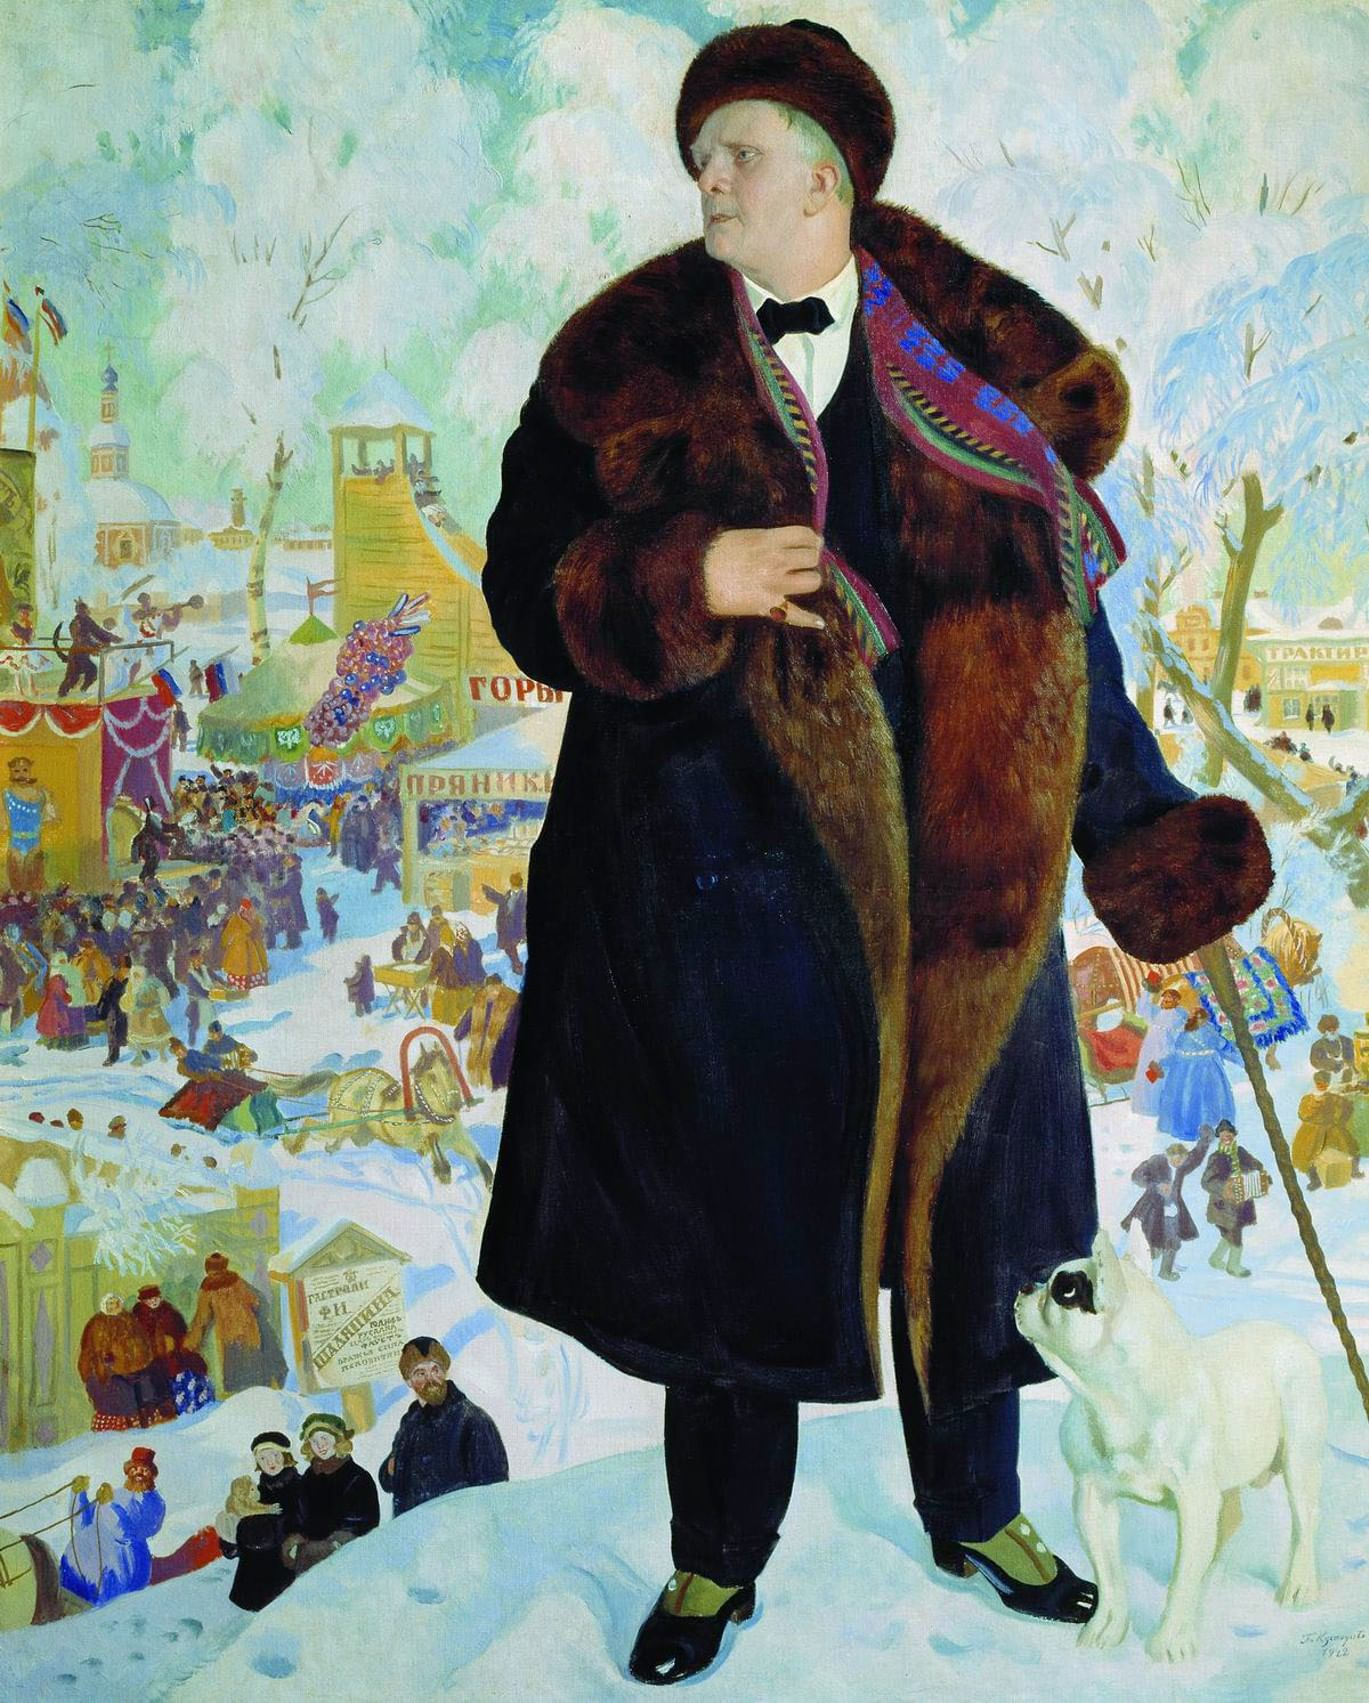 Фёдор Шаляпин: робкий великан, ставивший в тупик королей. Галерея 3